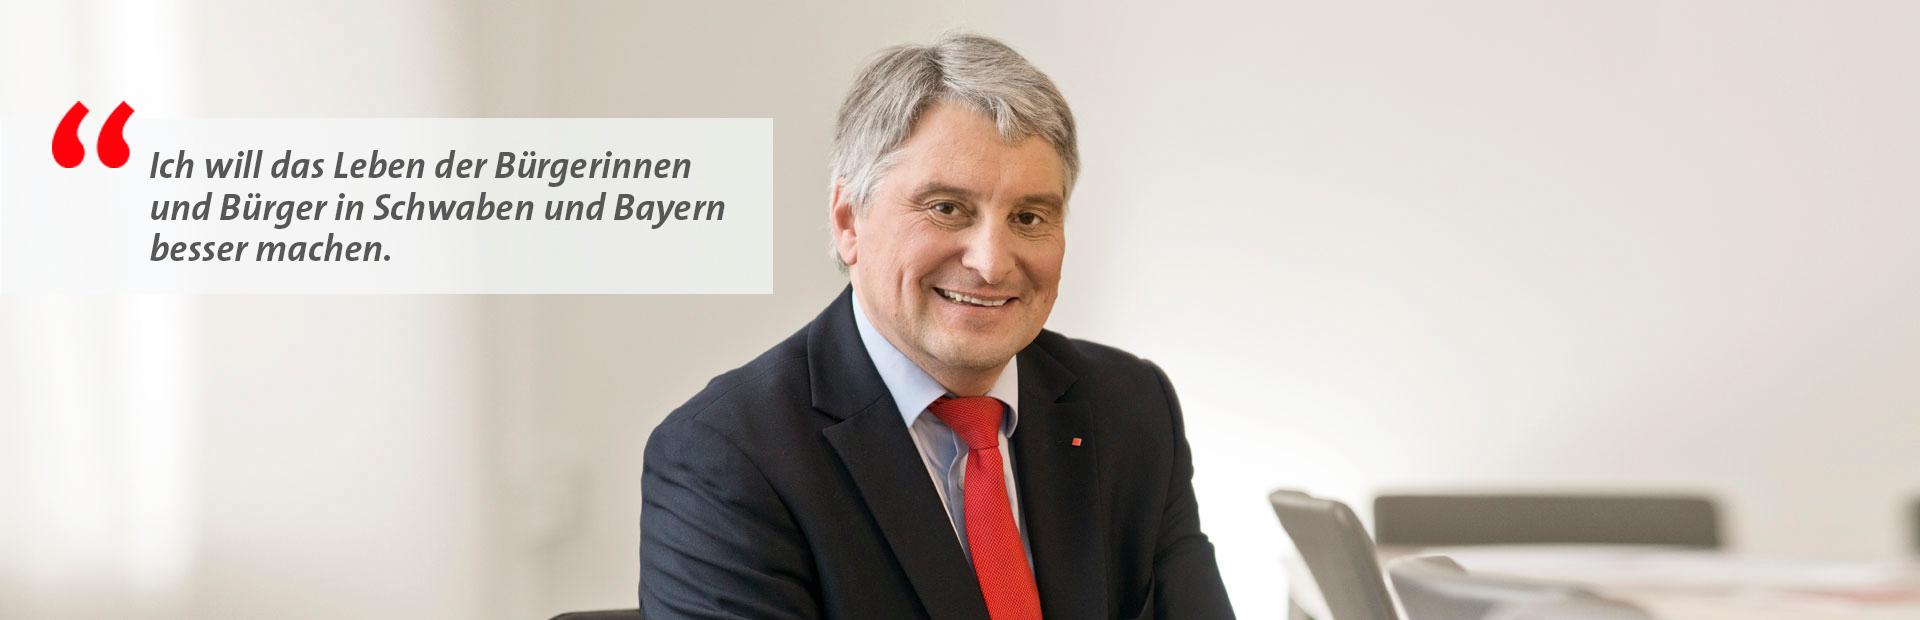 Harald Güller